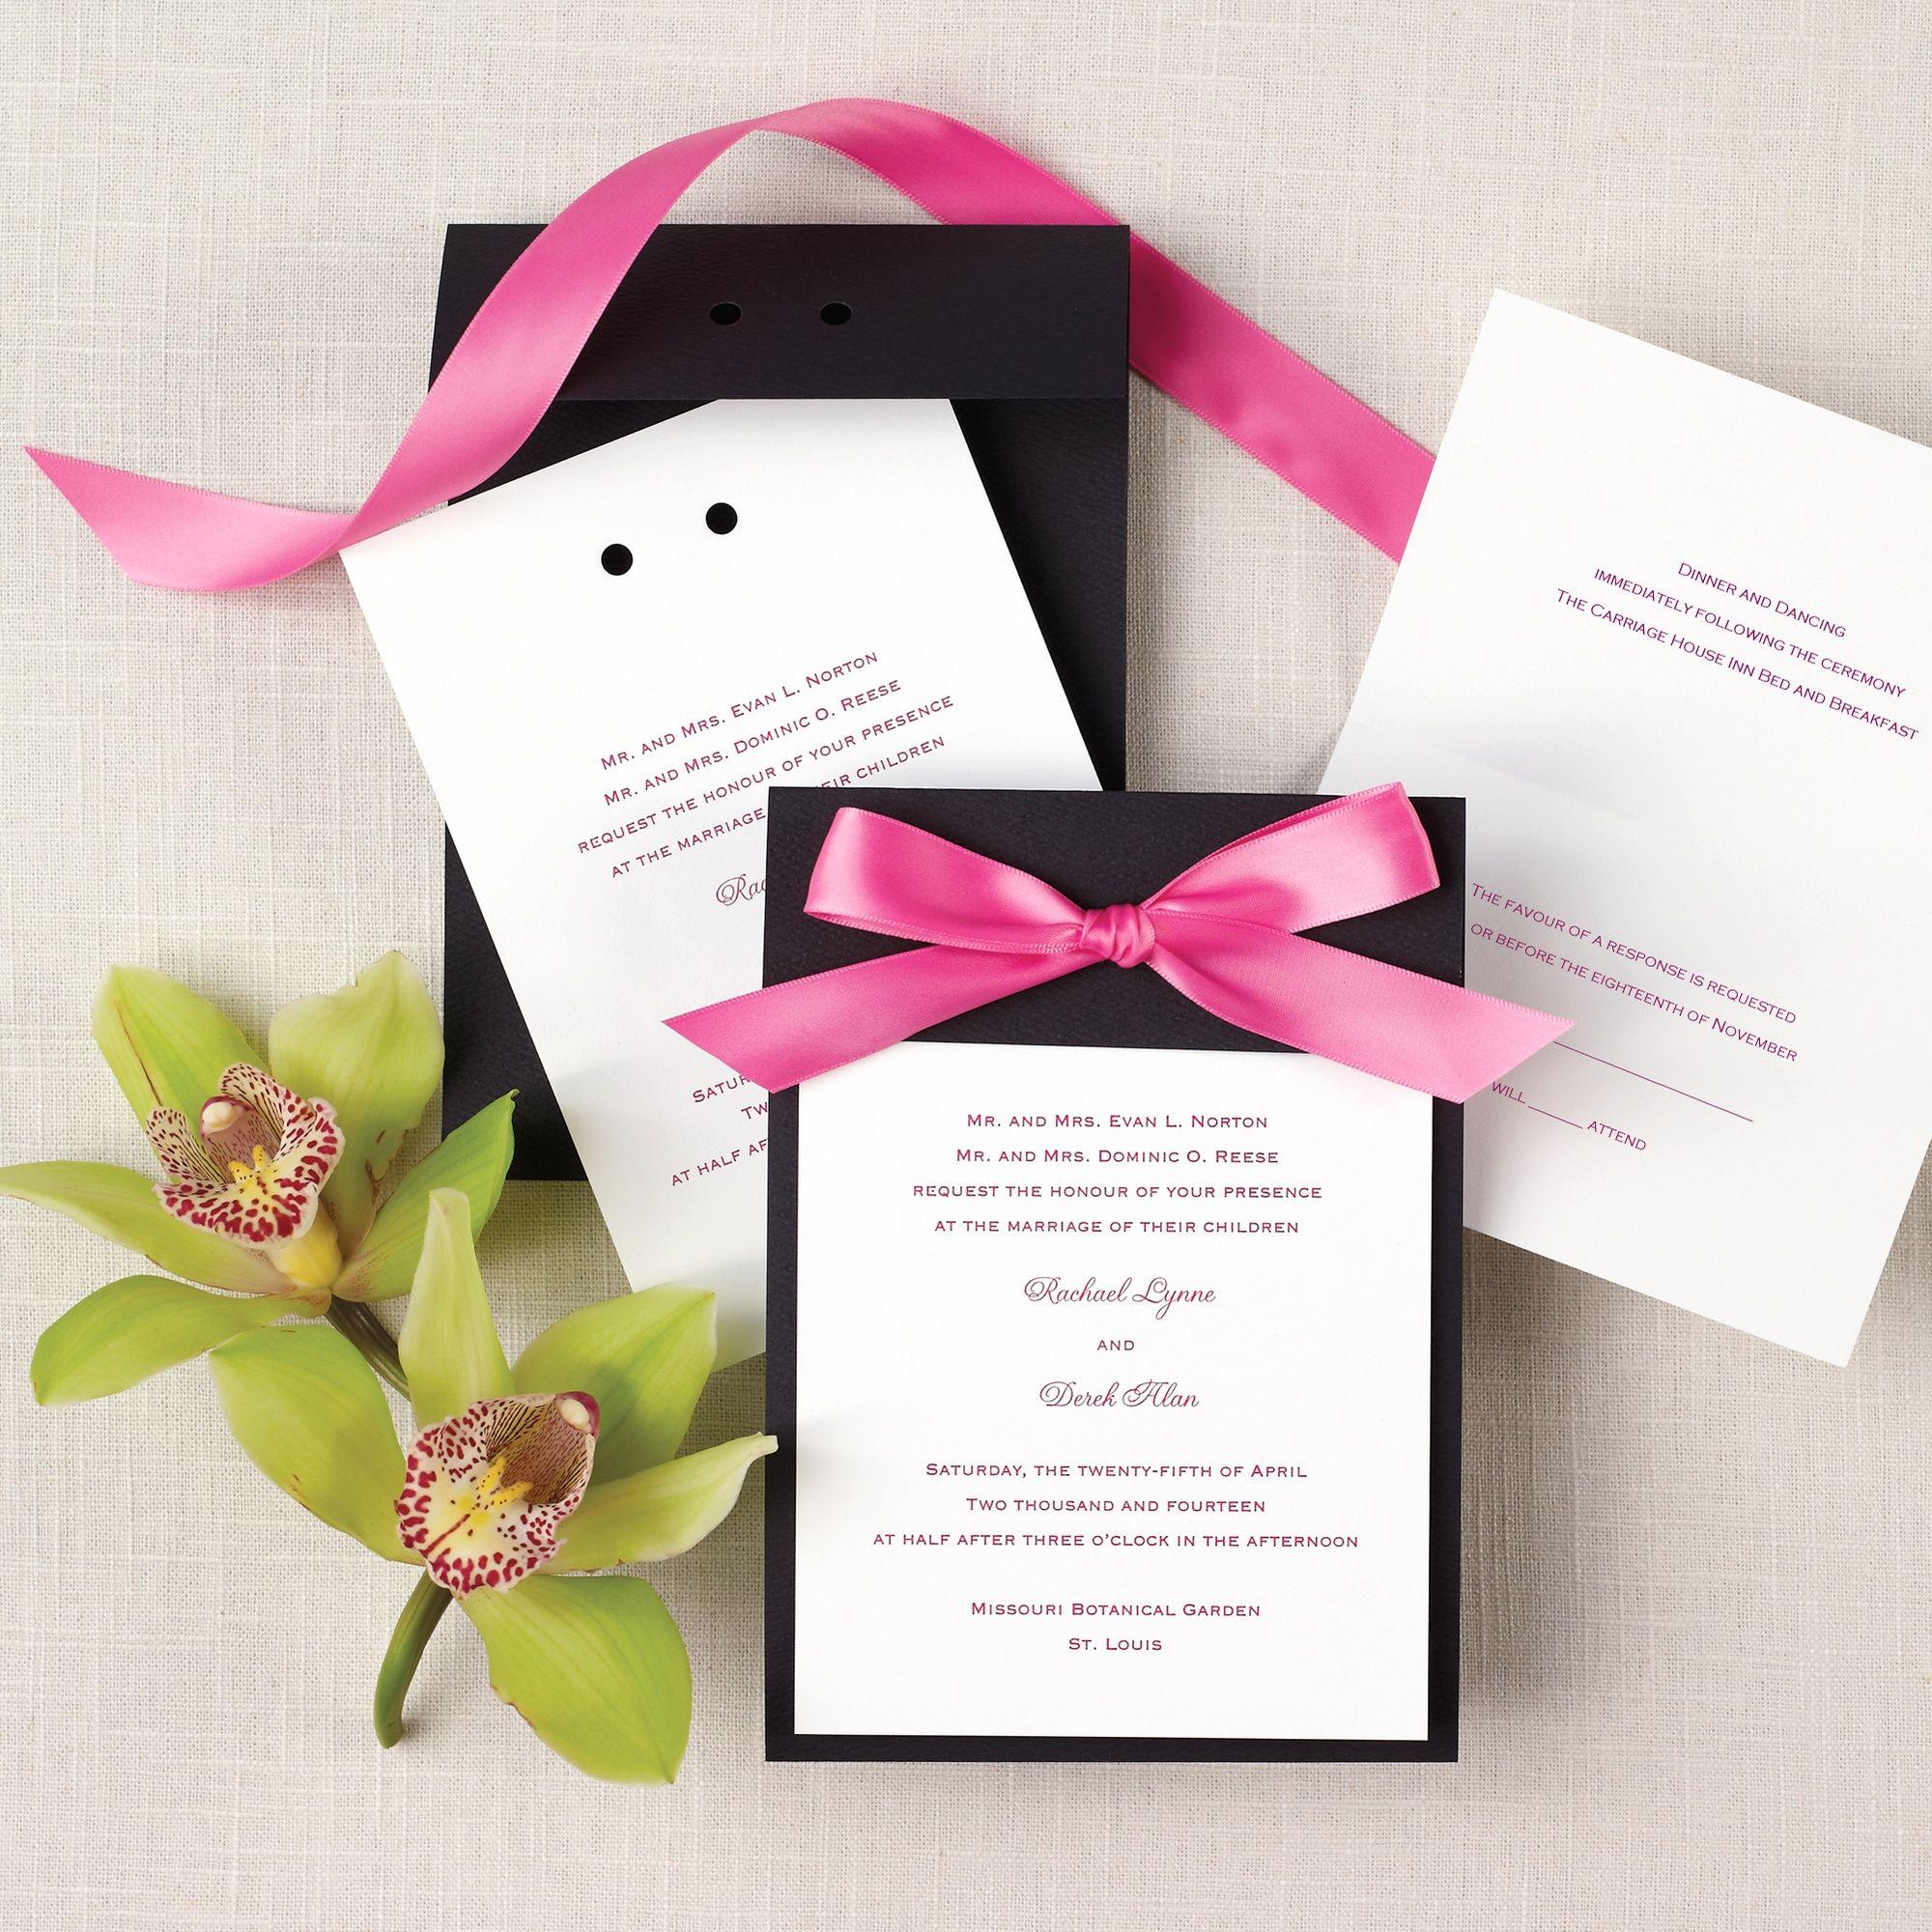 Color Duet Wedding Invitation | #exclusivelyweddings | #weddinginvitations